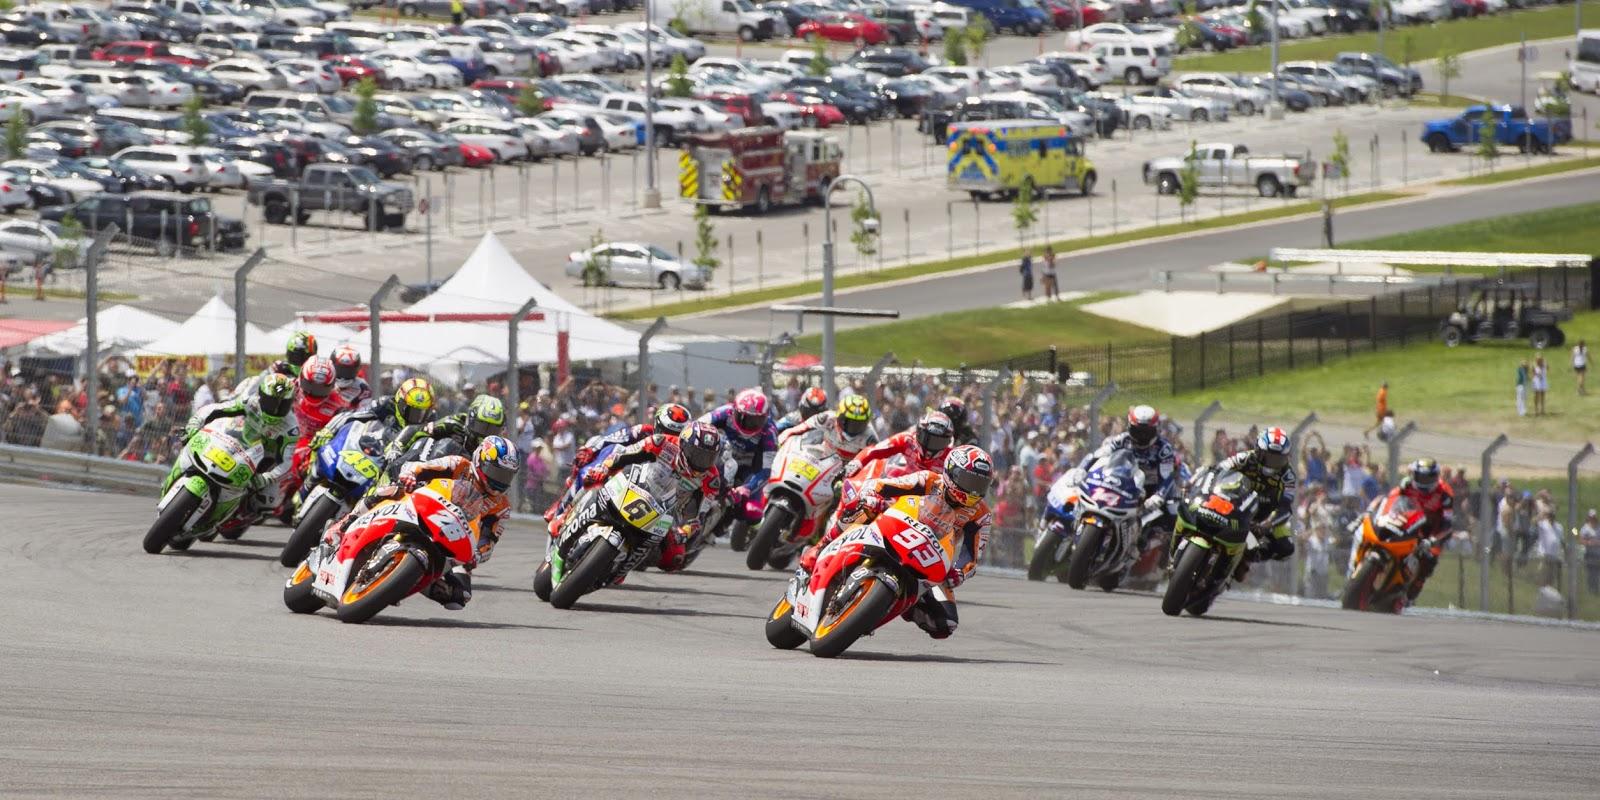 Kualifikasi Motogp Austin Amerika 2014 | MotoGP 2017 Info, Video, Points Table